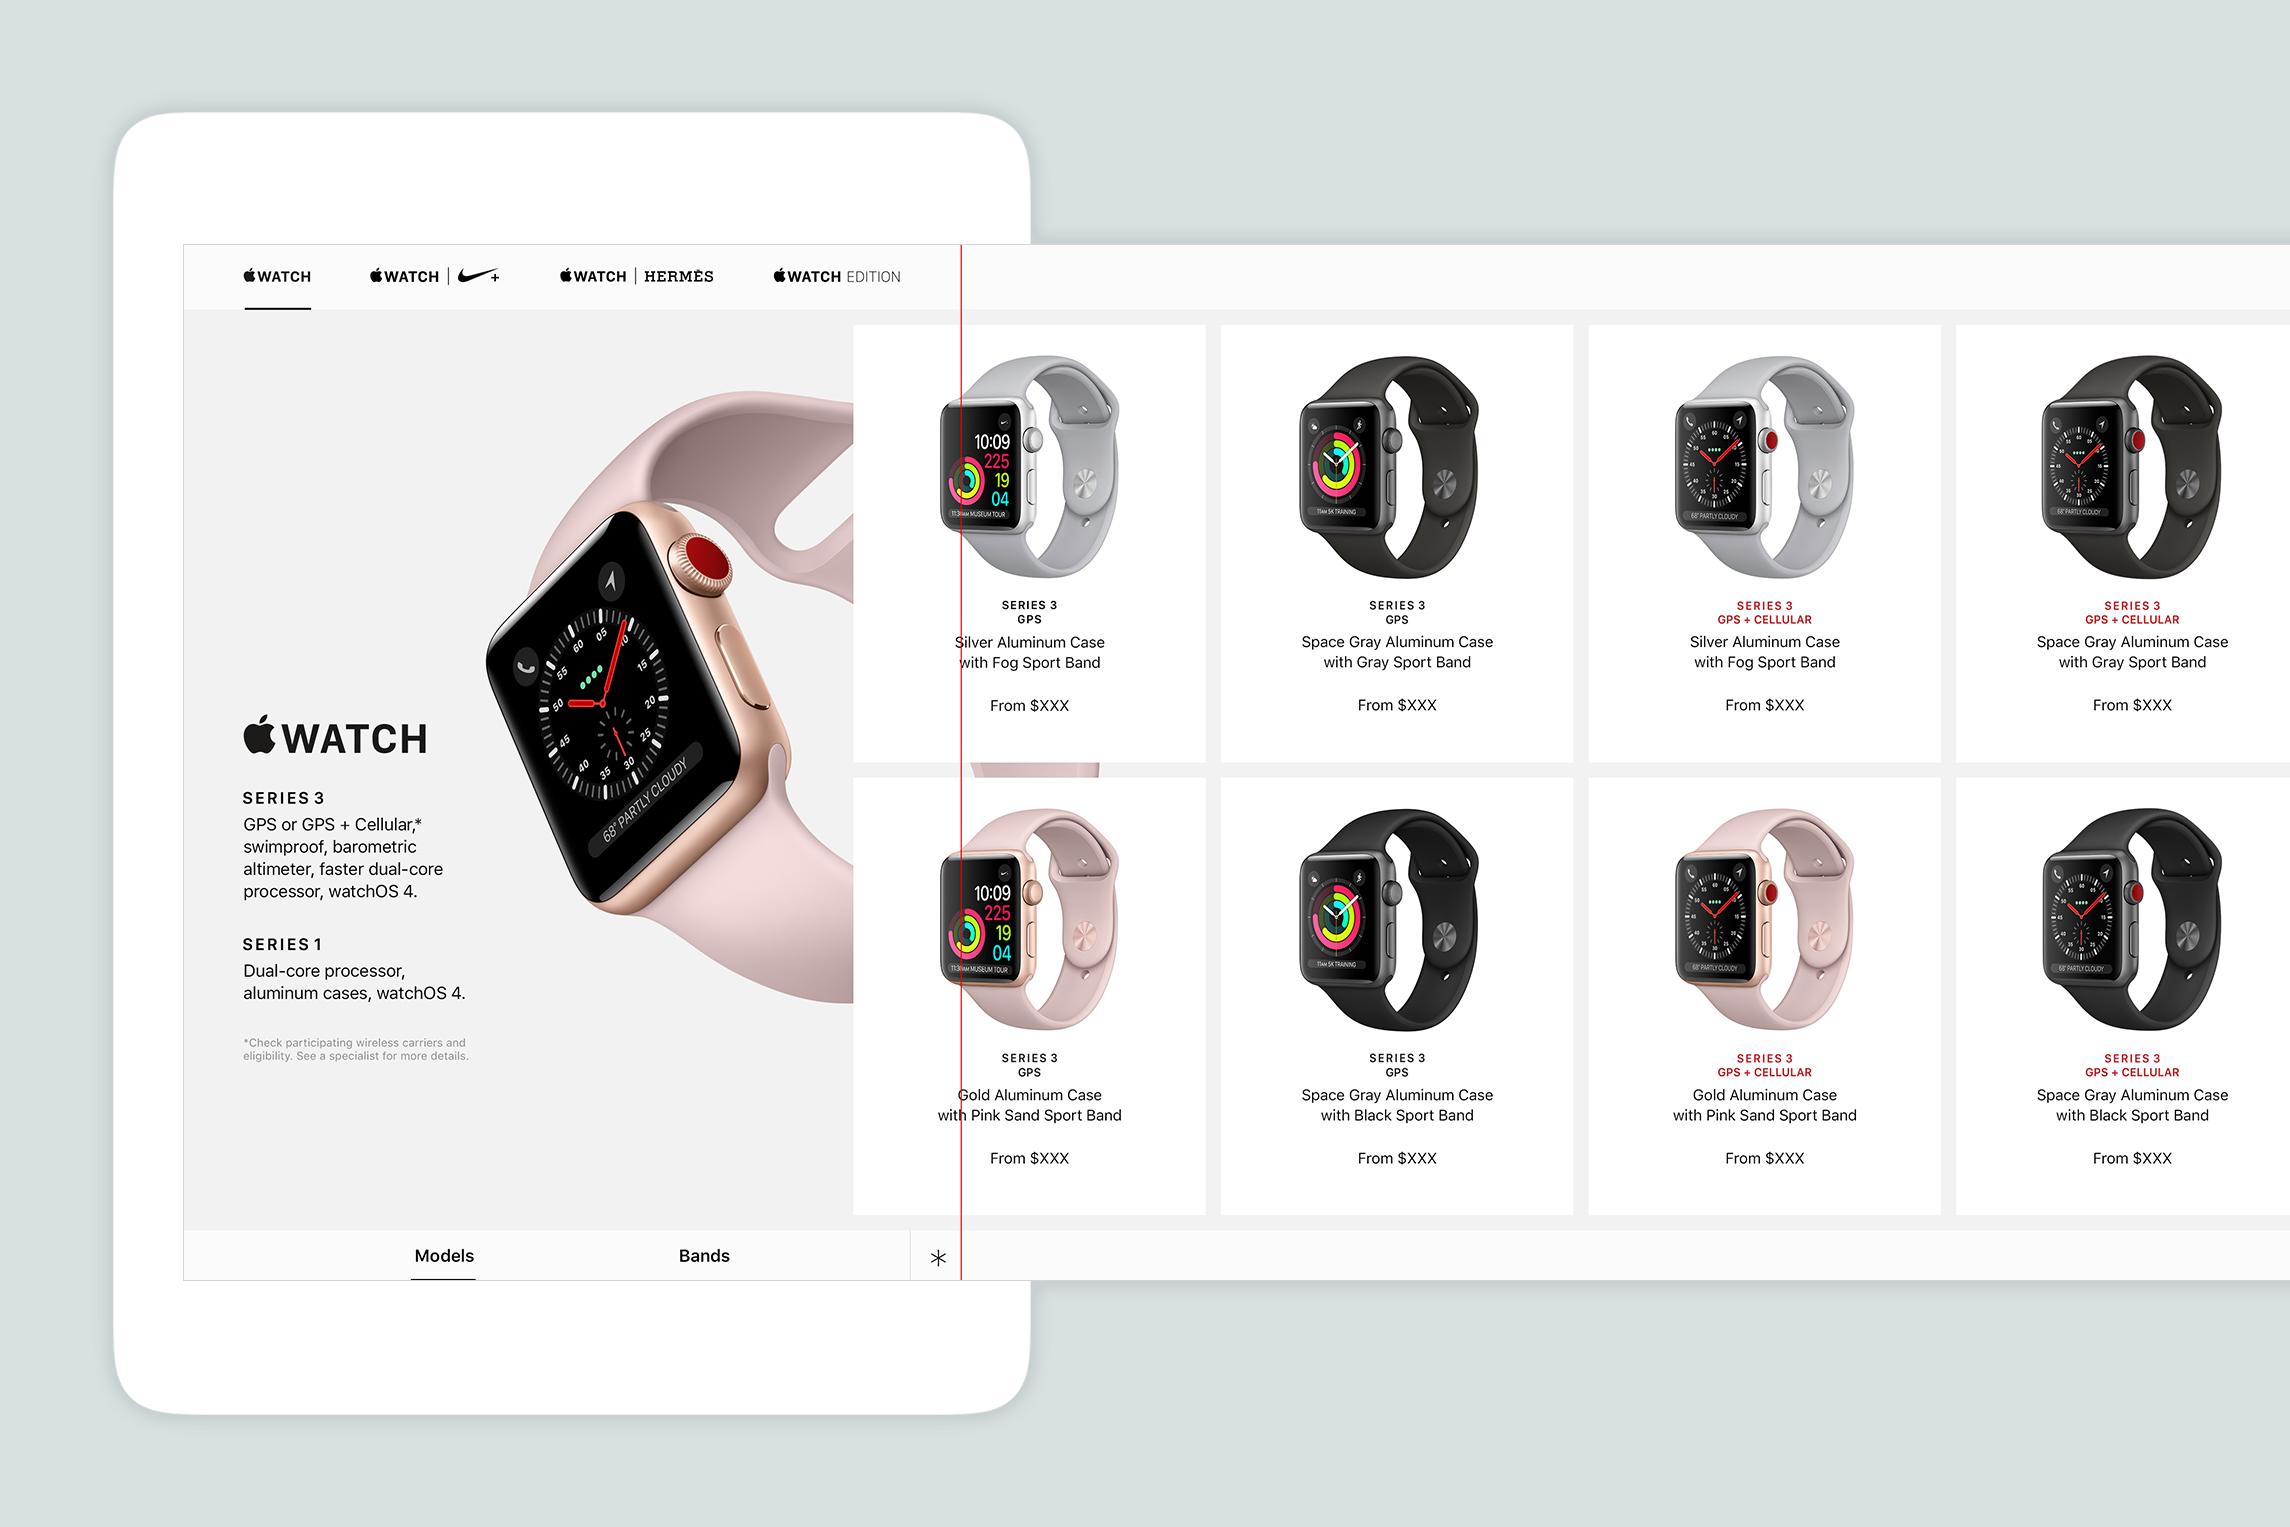 03-AppleWatchDemo-1Up-iPad-Models.jpg